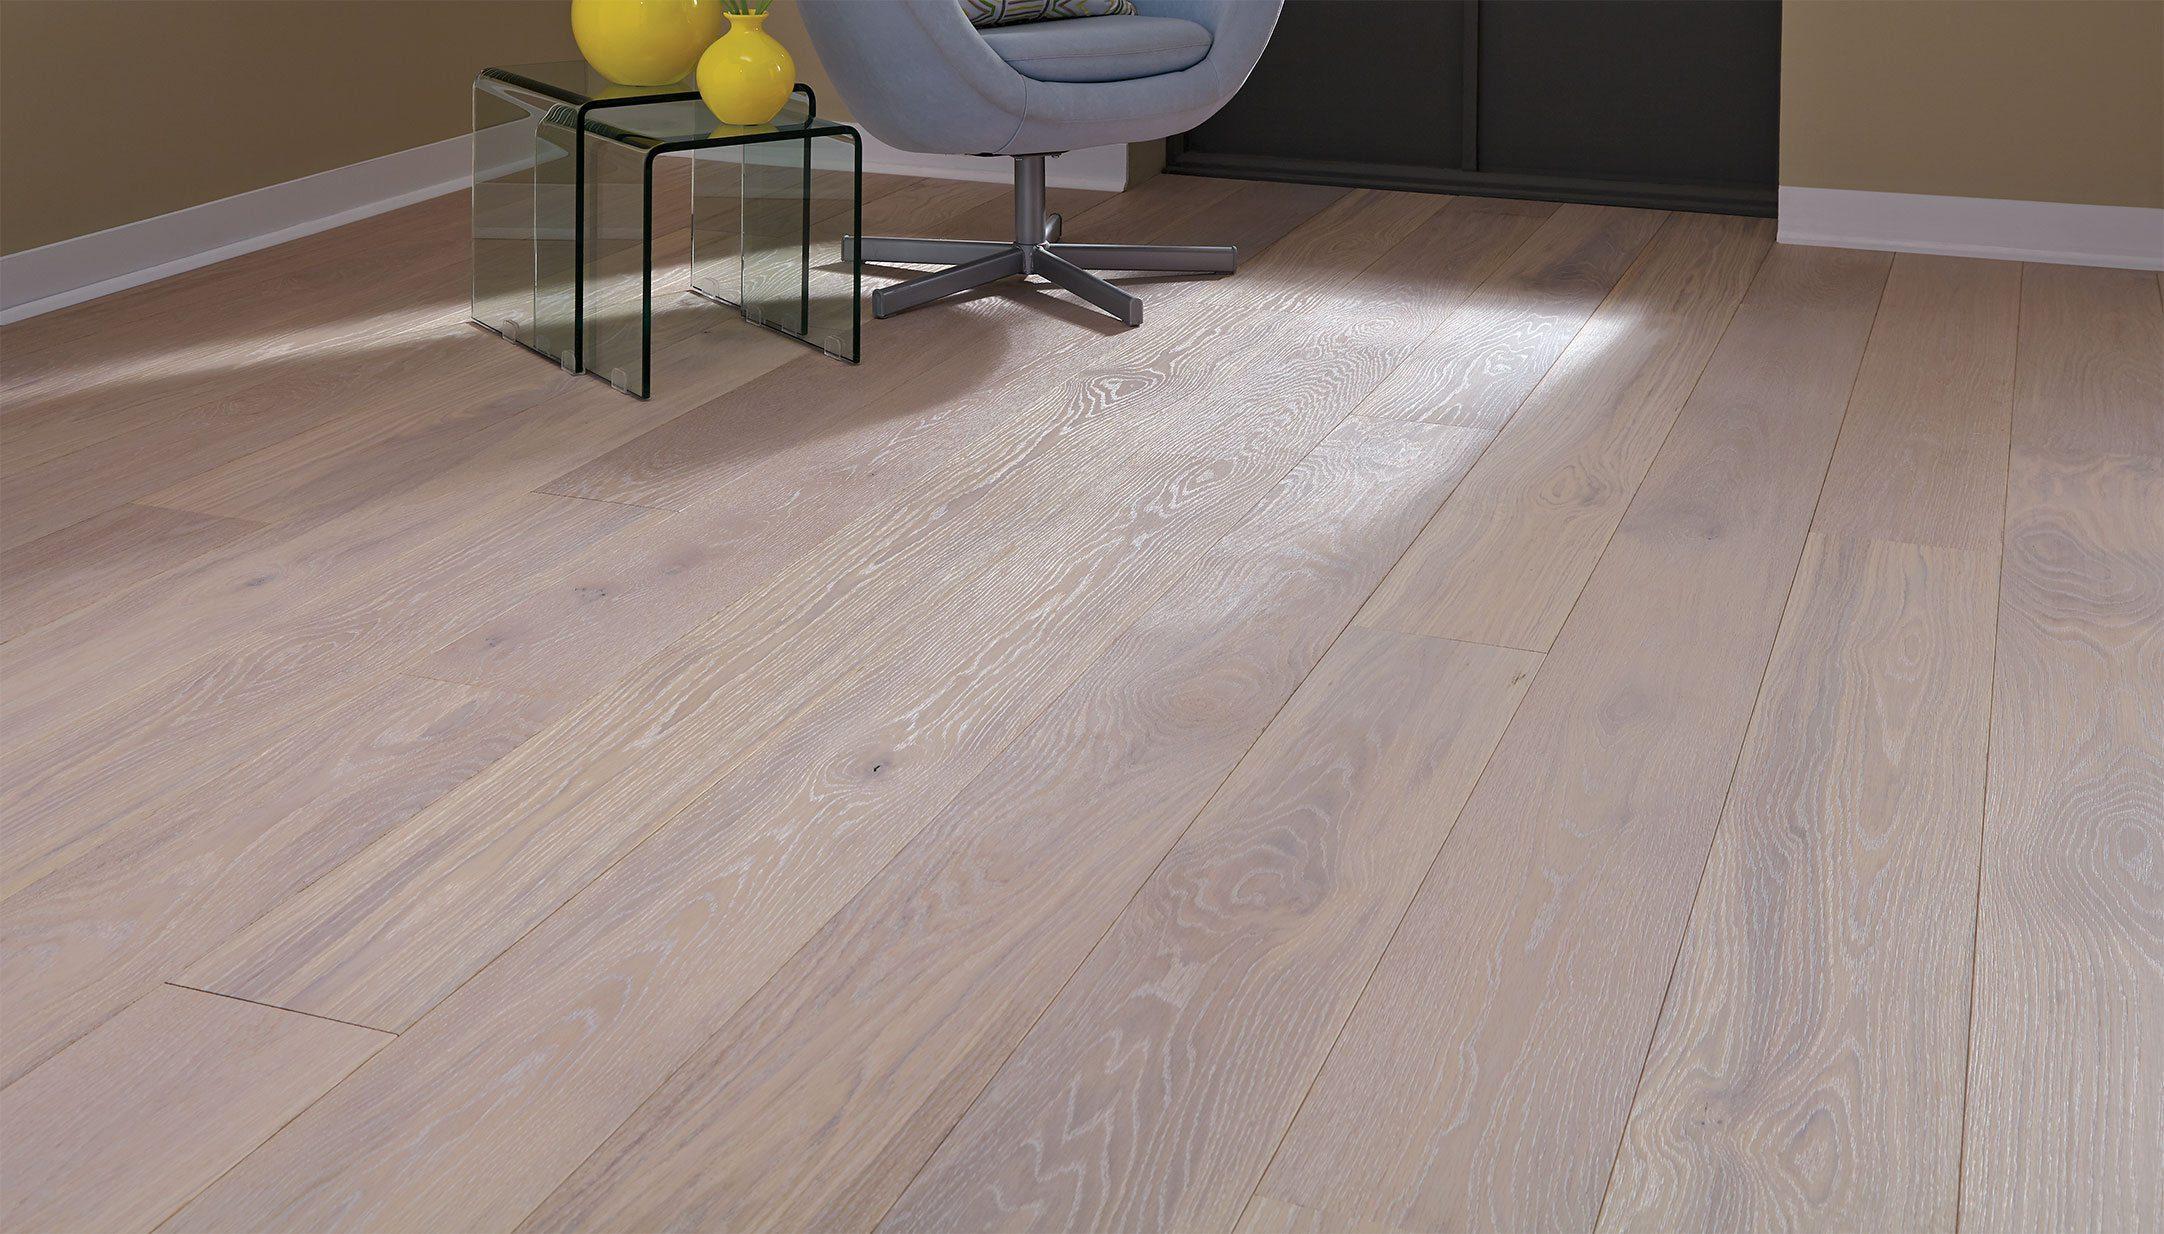 Good ... Marideck Marine Vinyl Flooring By Nautolex Marine Vinyl Flooring  Flooring Designs ...